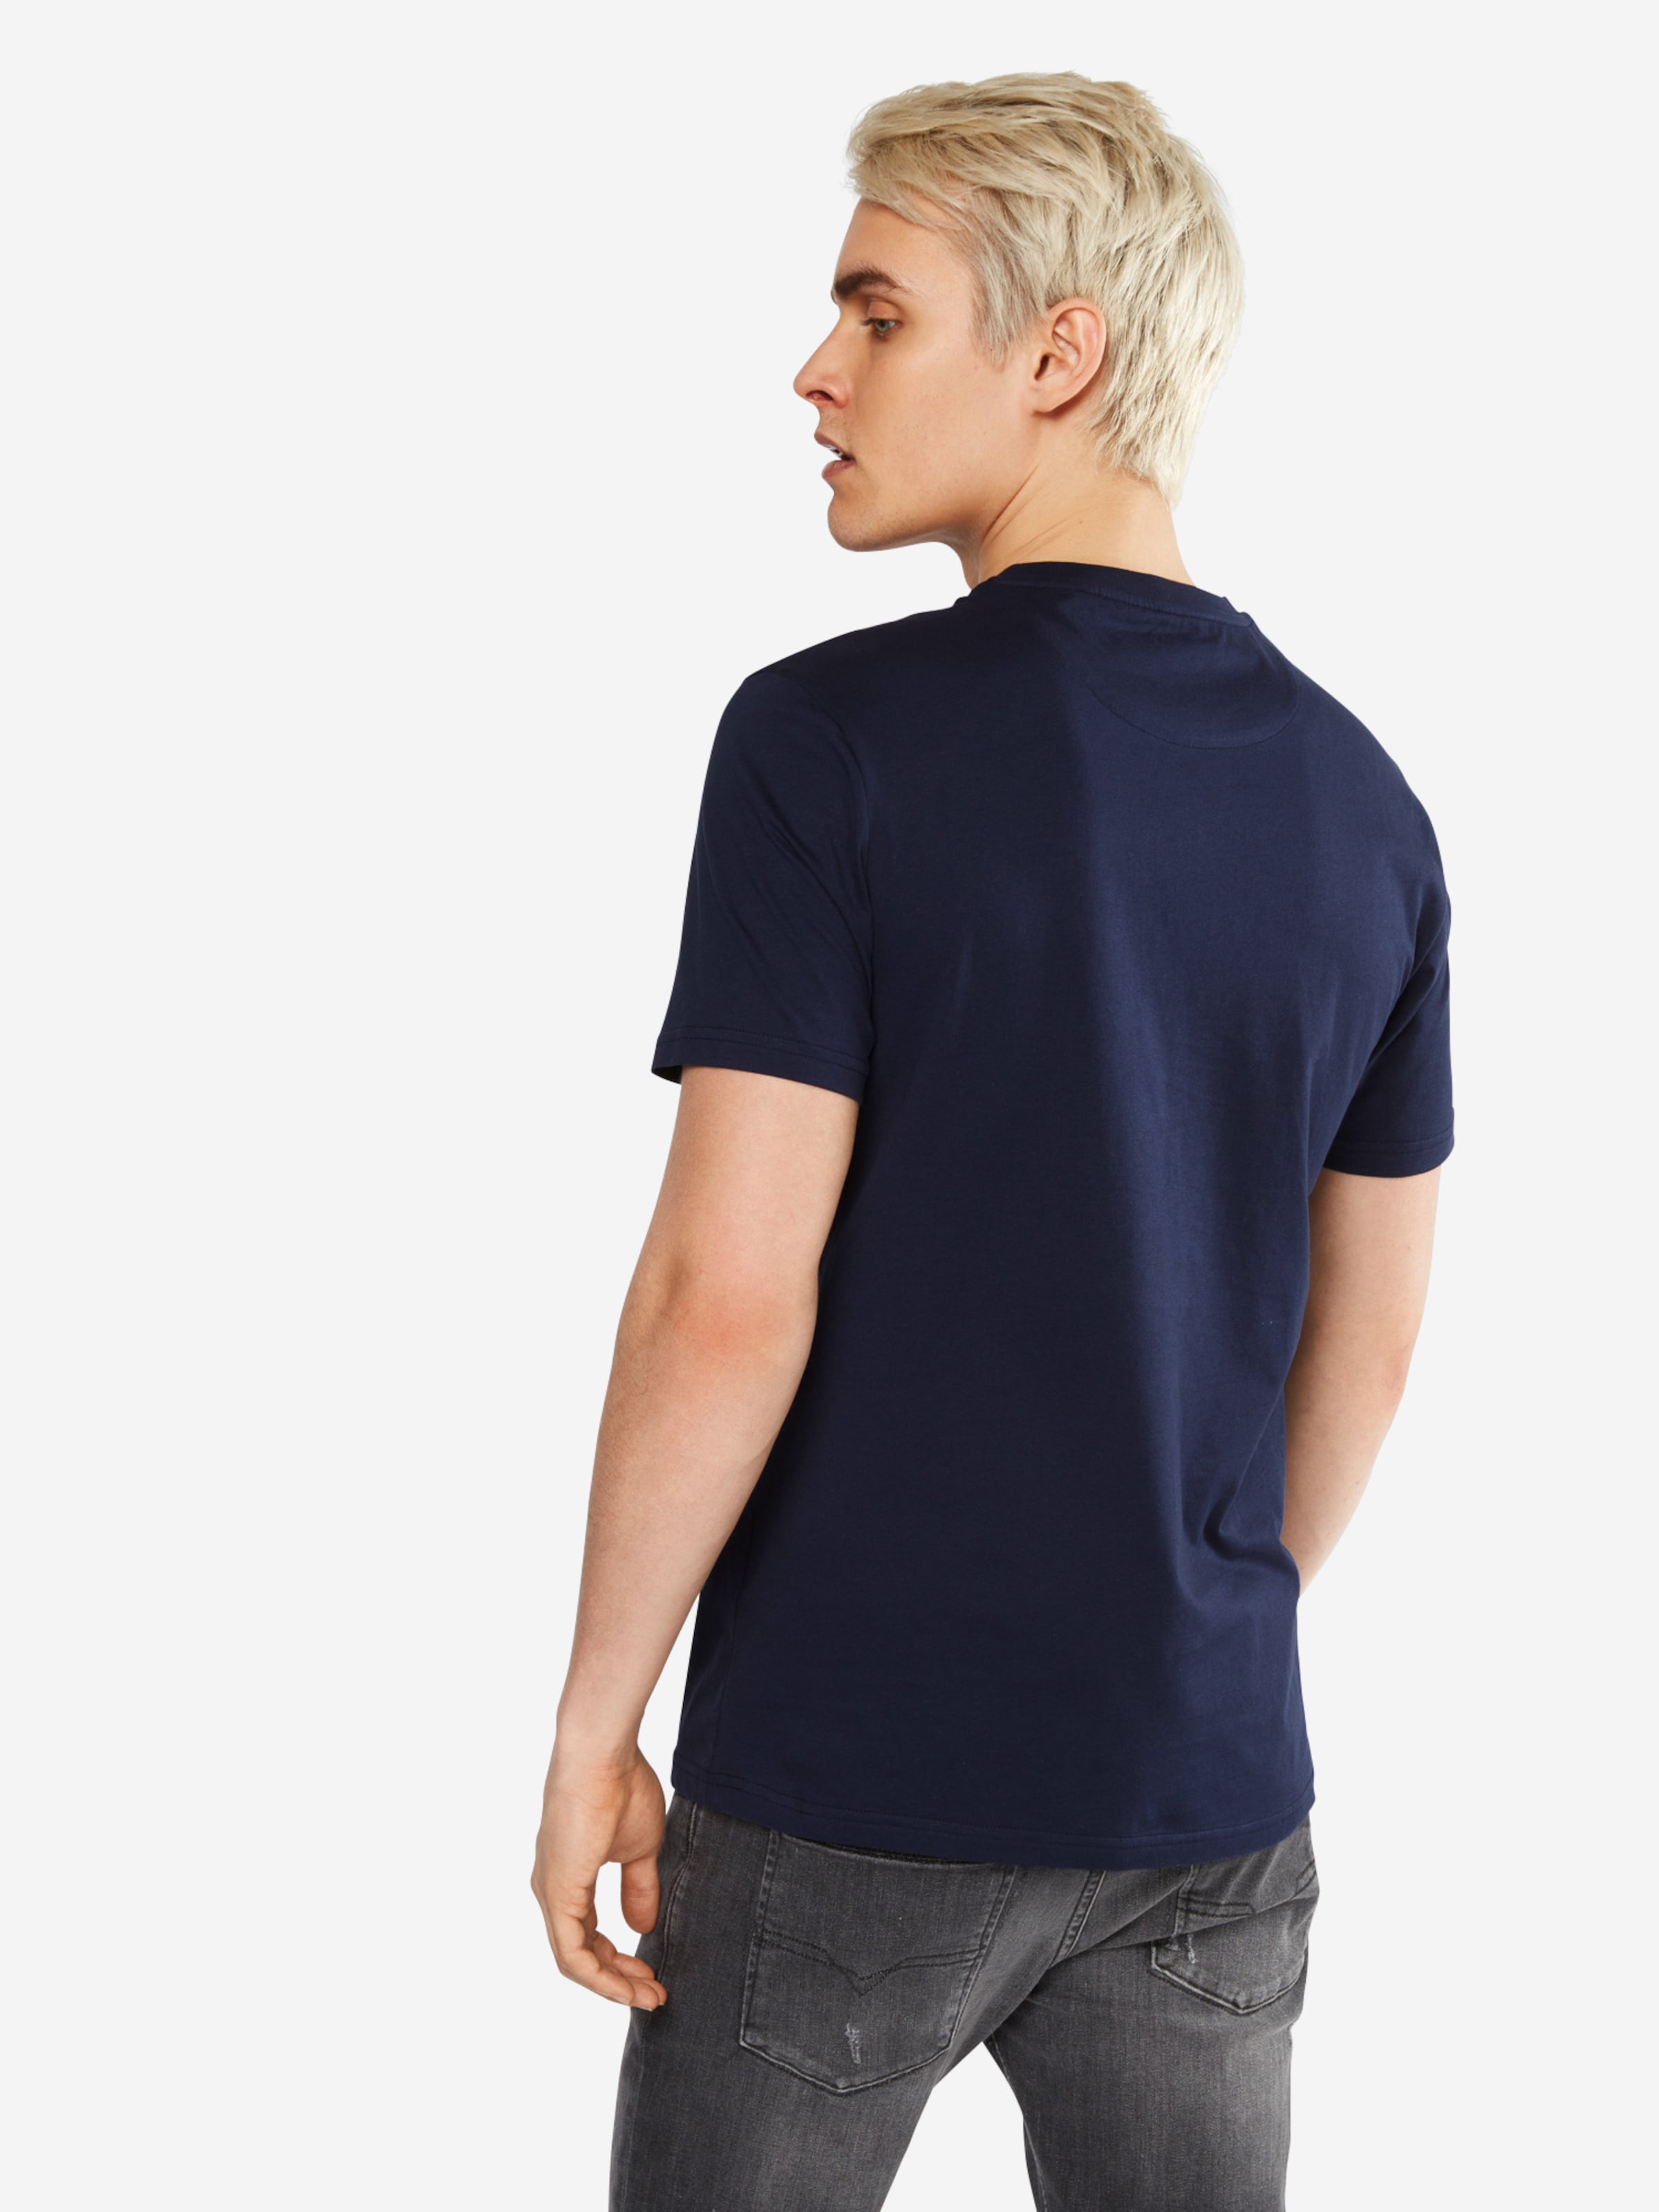 Lyle & Scott T-Shirt 'Stripe Pocket' Rabatt Erschwinglich LgC3lrg